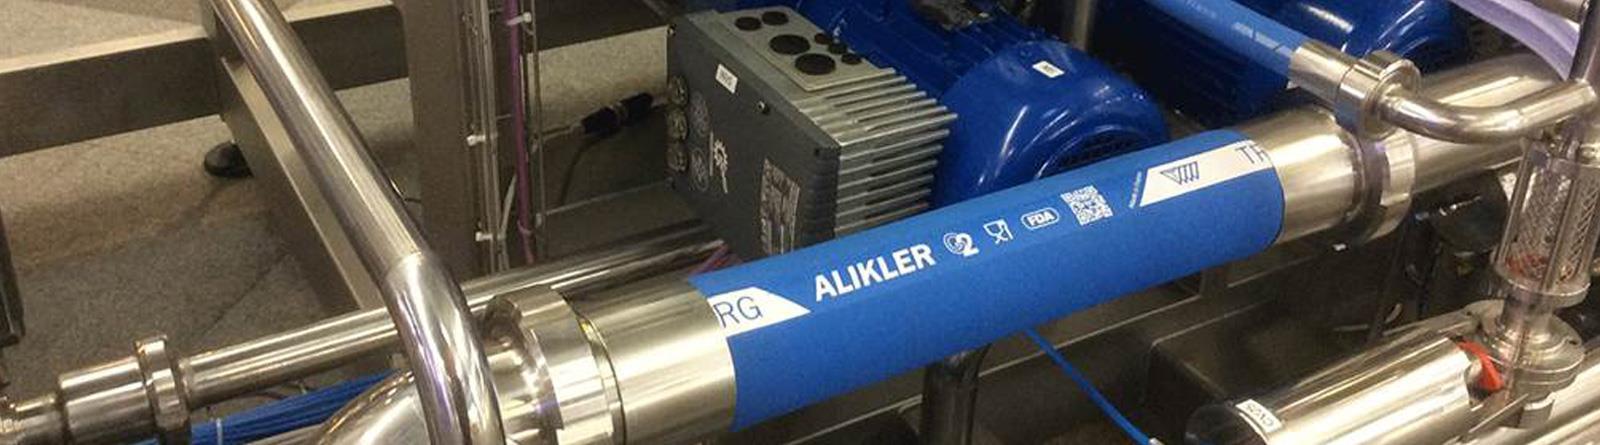 Trelleborg Alikler G2 Food Industry Transfer